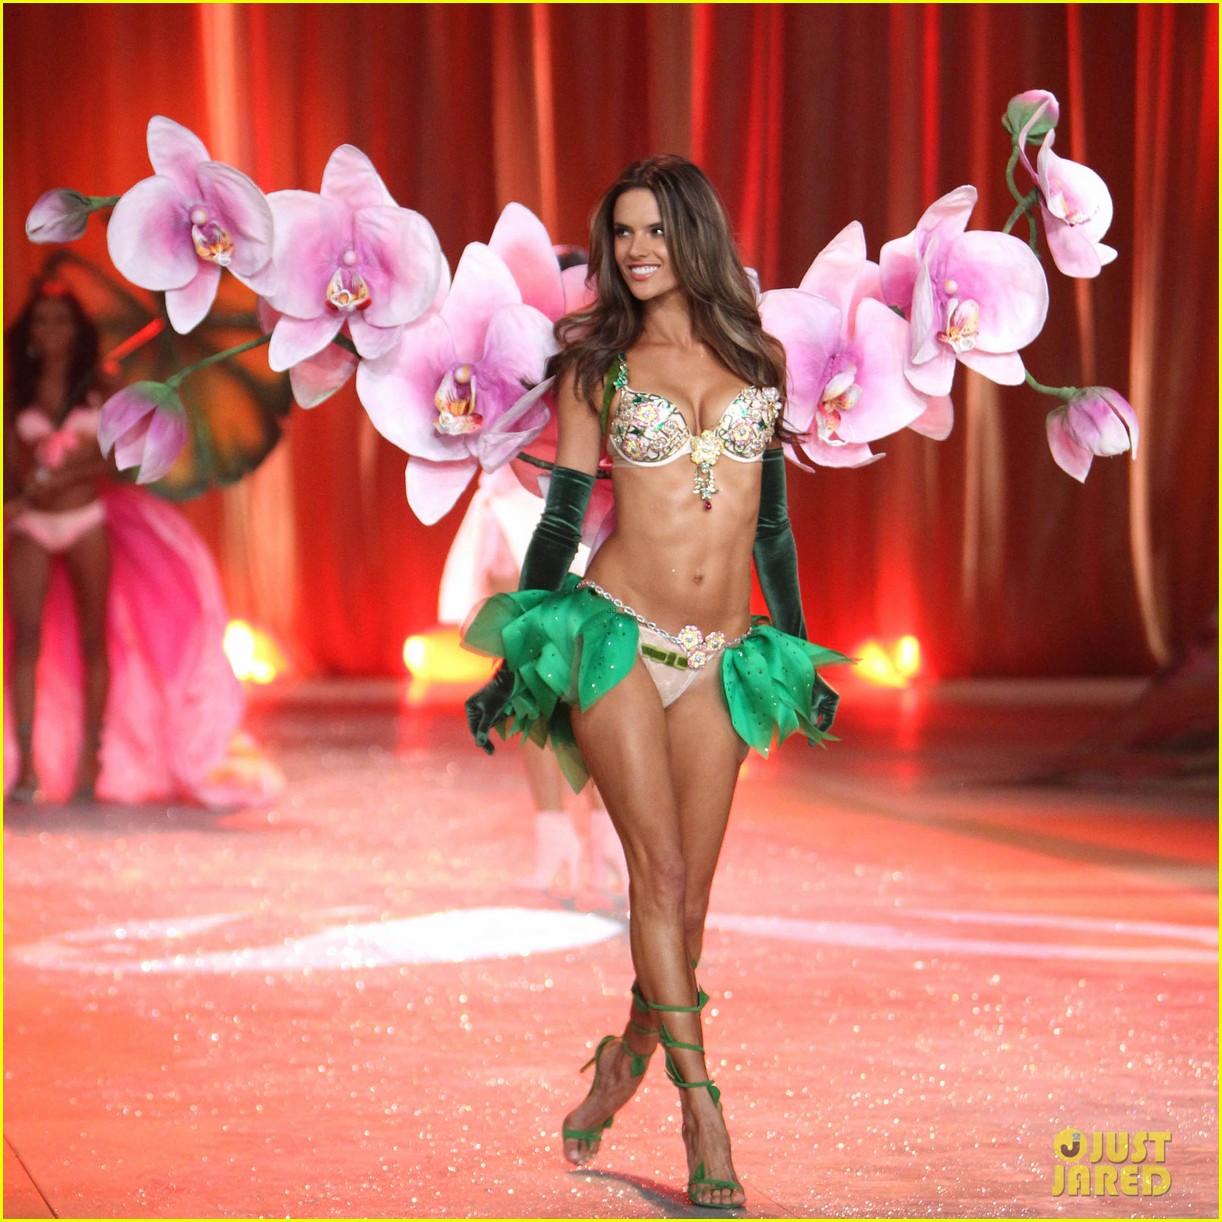 http://1.bp.blogspot.com/-_s7tNgCTVv8/UJu8PdG24nI/AAAAAAAAESE/sawf5fLBKzE/s1600/Alessandra+Ambrosio+Victoria\'s+Secret+Fashion+Show+Runway+in+NewYork+7+November+2012+(1).jpg